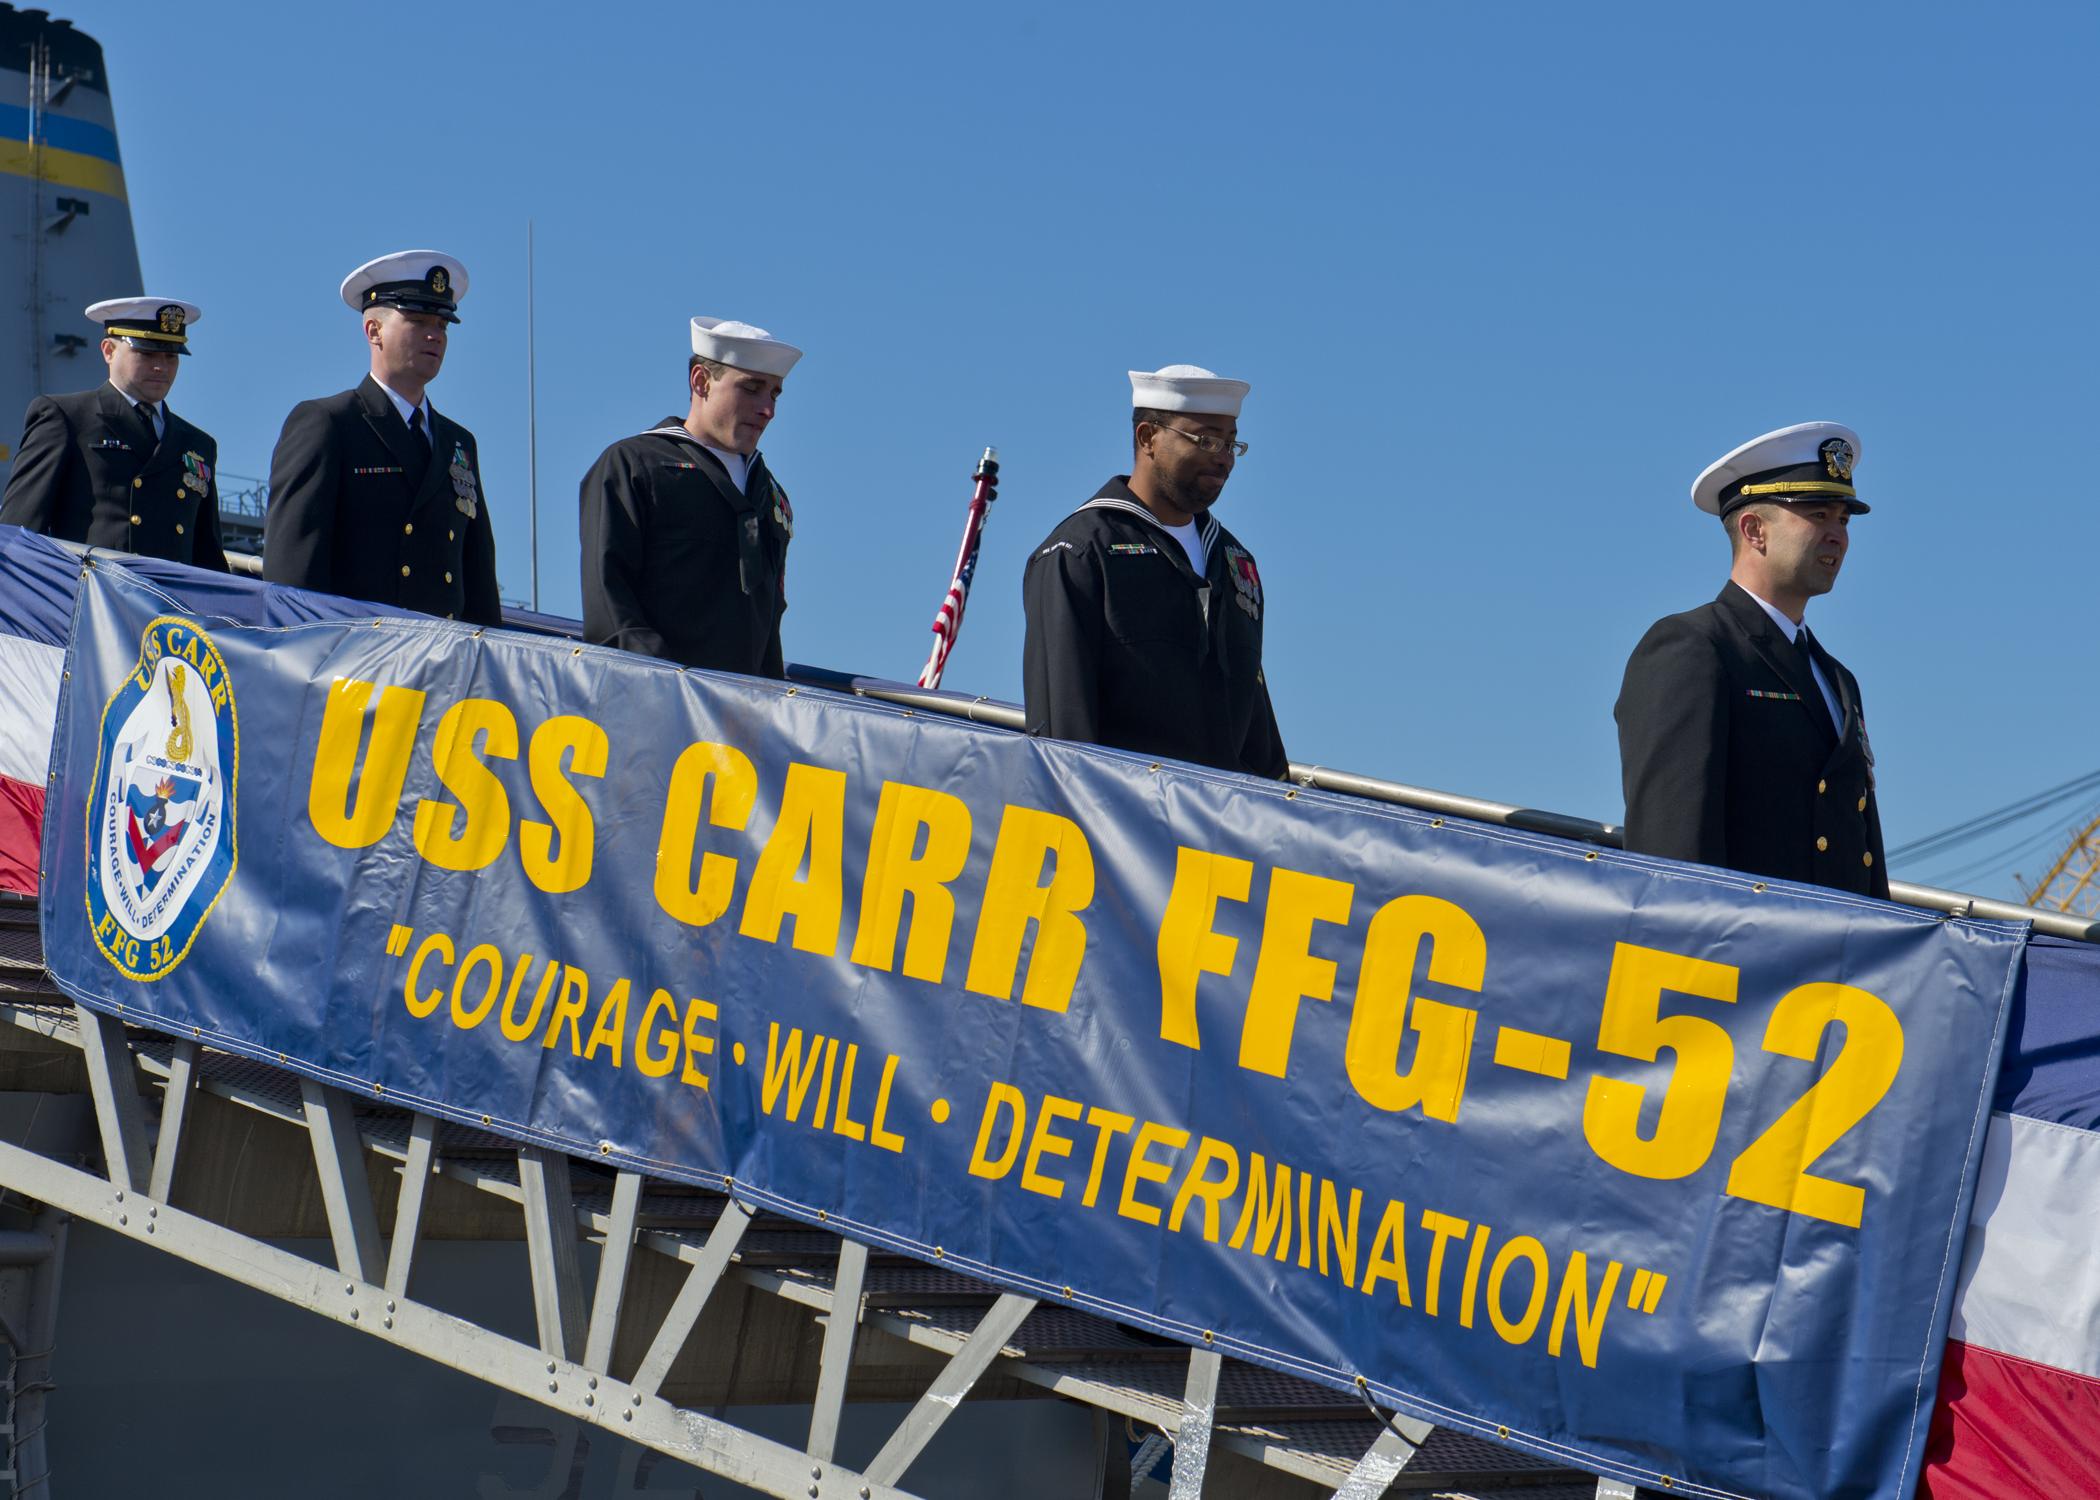 USS CARR FFG-52 Decomissioning Ceremony 13.03.2013Bild: U.S. Navy